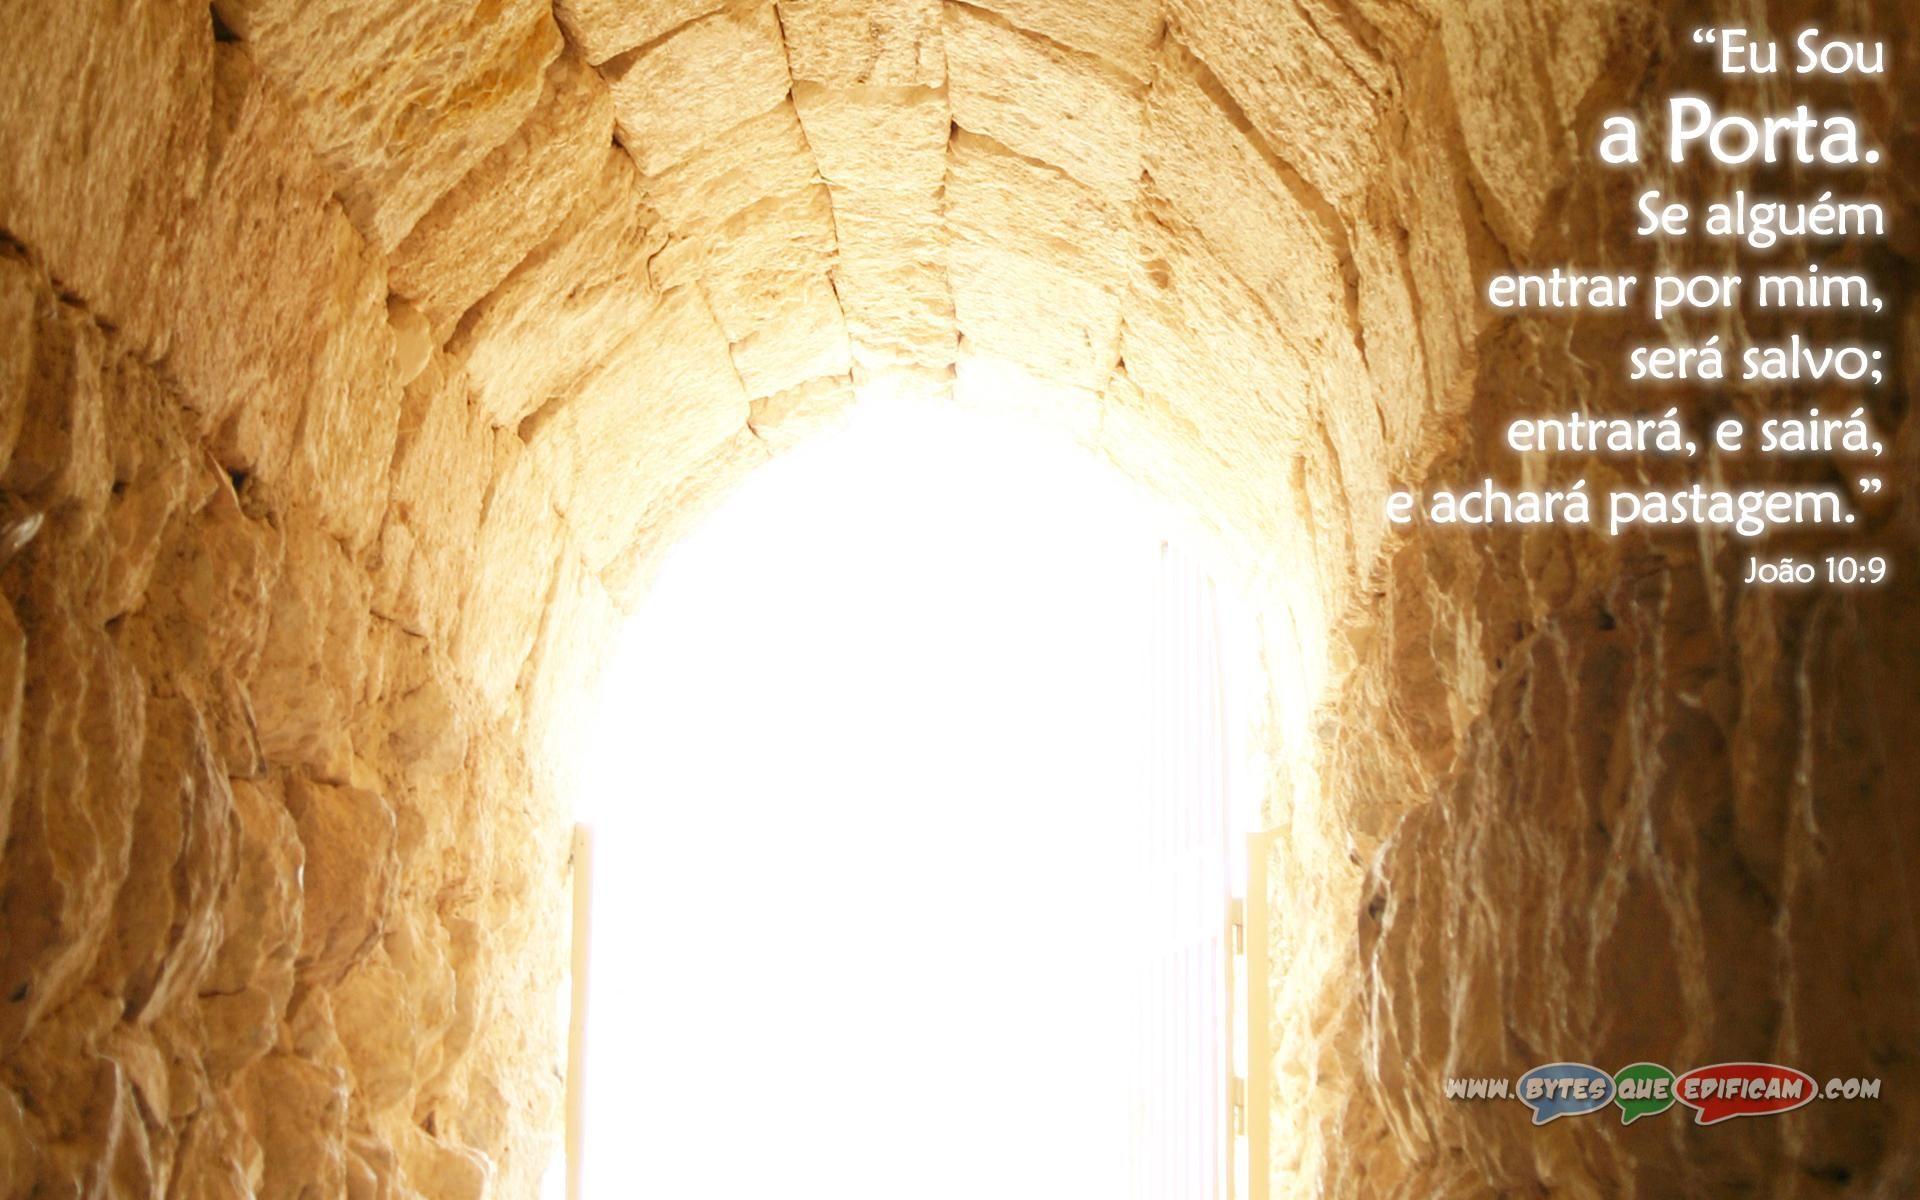 Frases Bíblicas Imagens Gospel: Frases Gospel, Mensagens Gospel